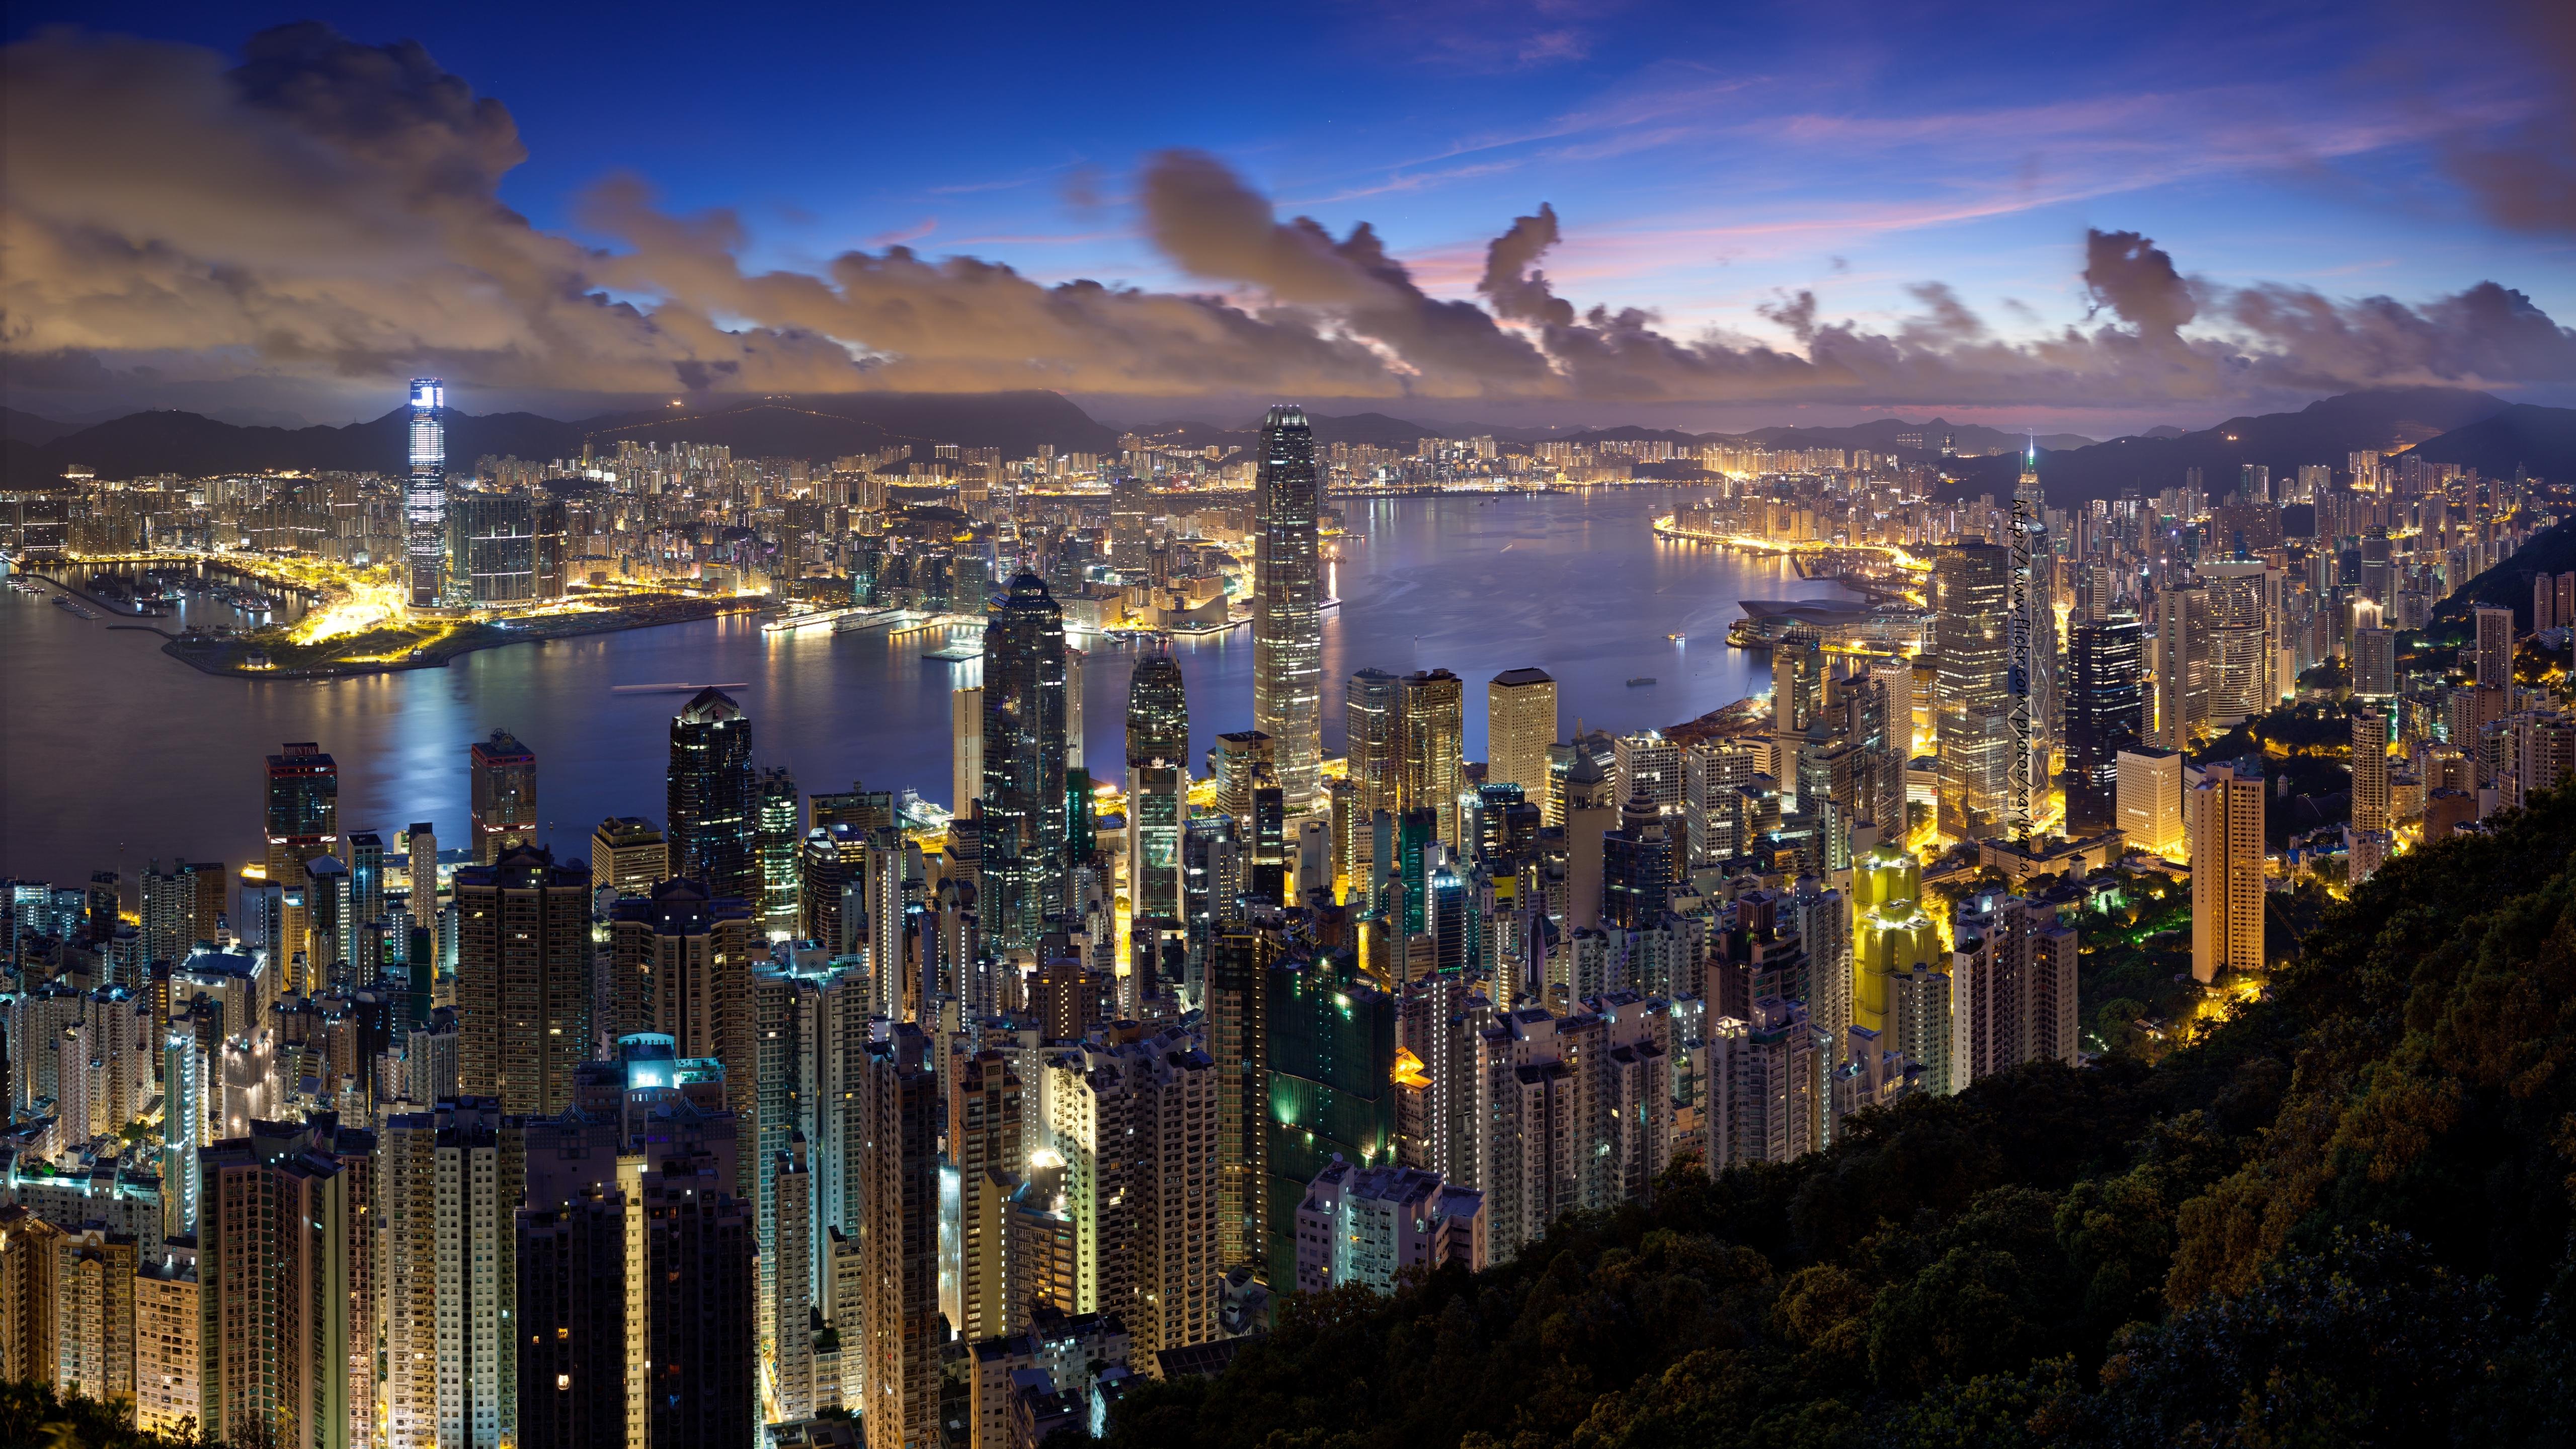 5120x2880 city, hong kong, night 5K Wallpaper, HD City 4K ...